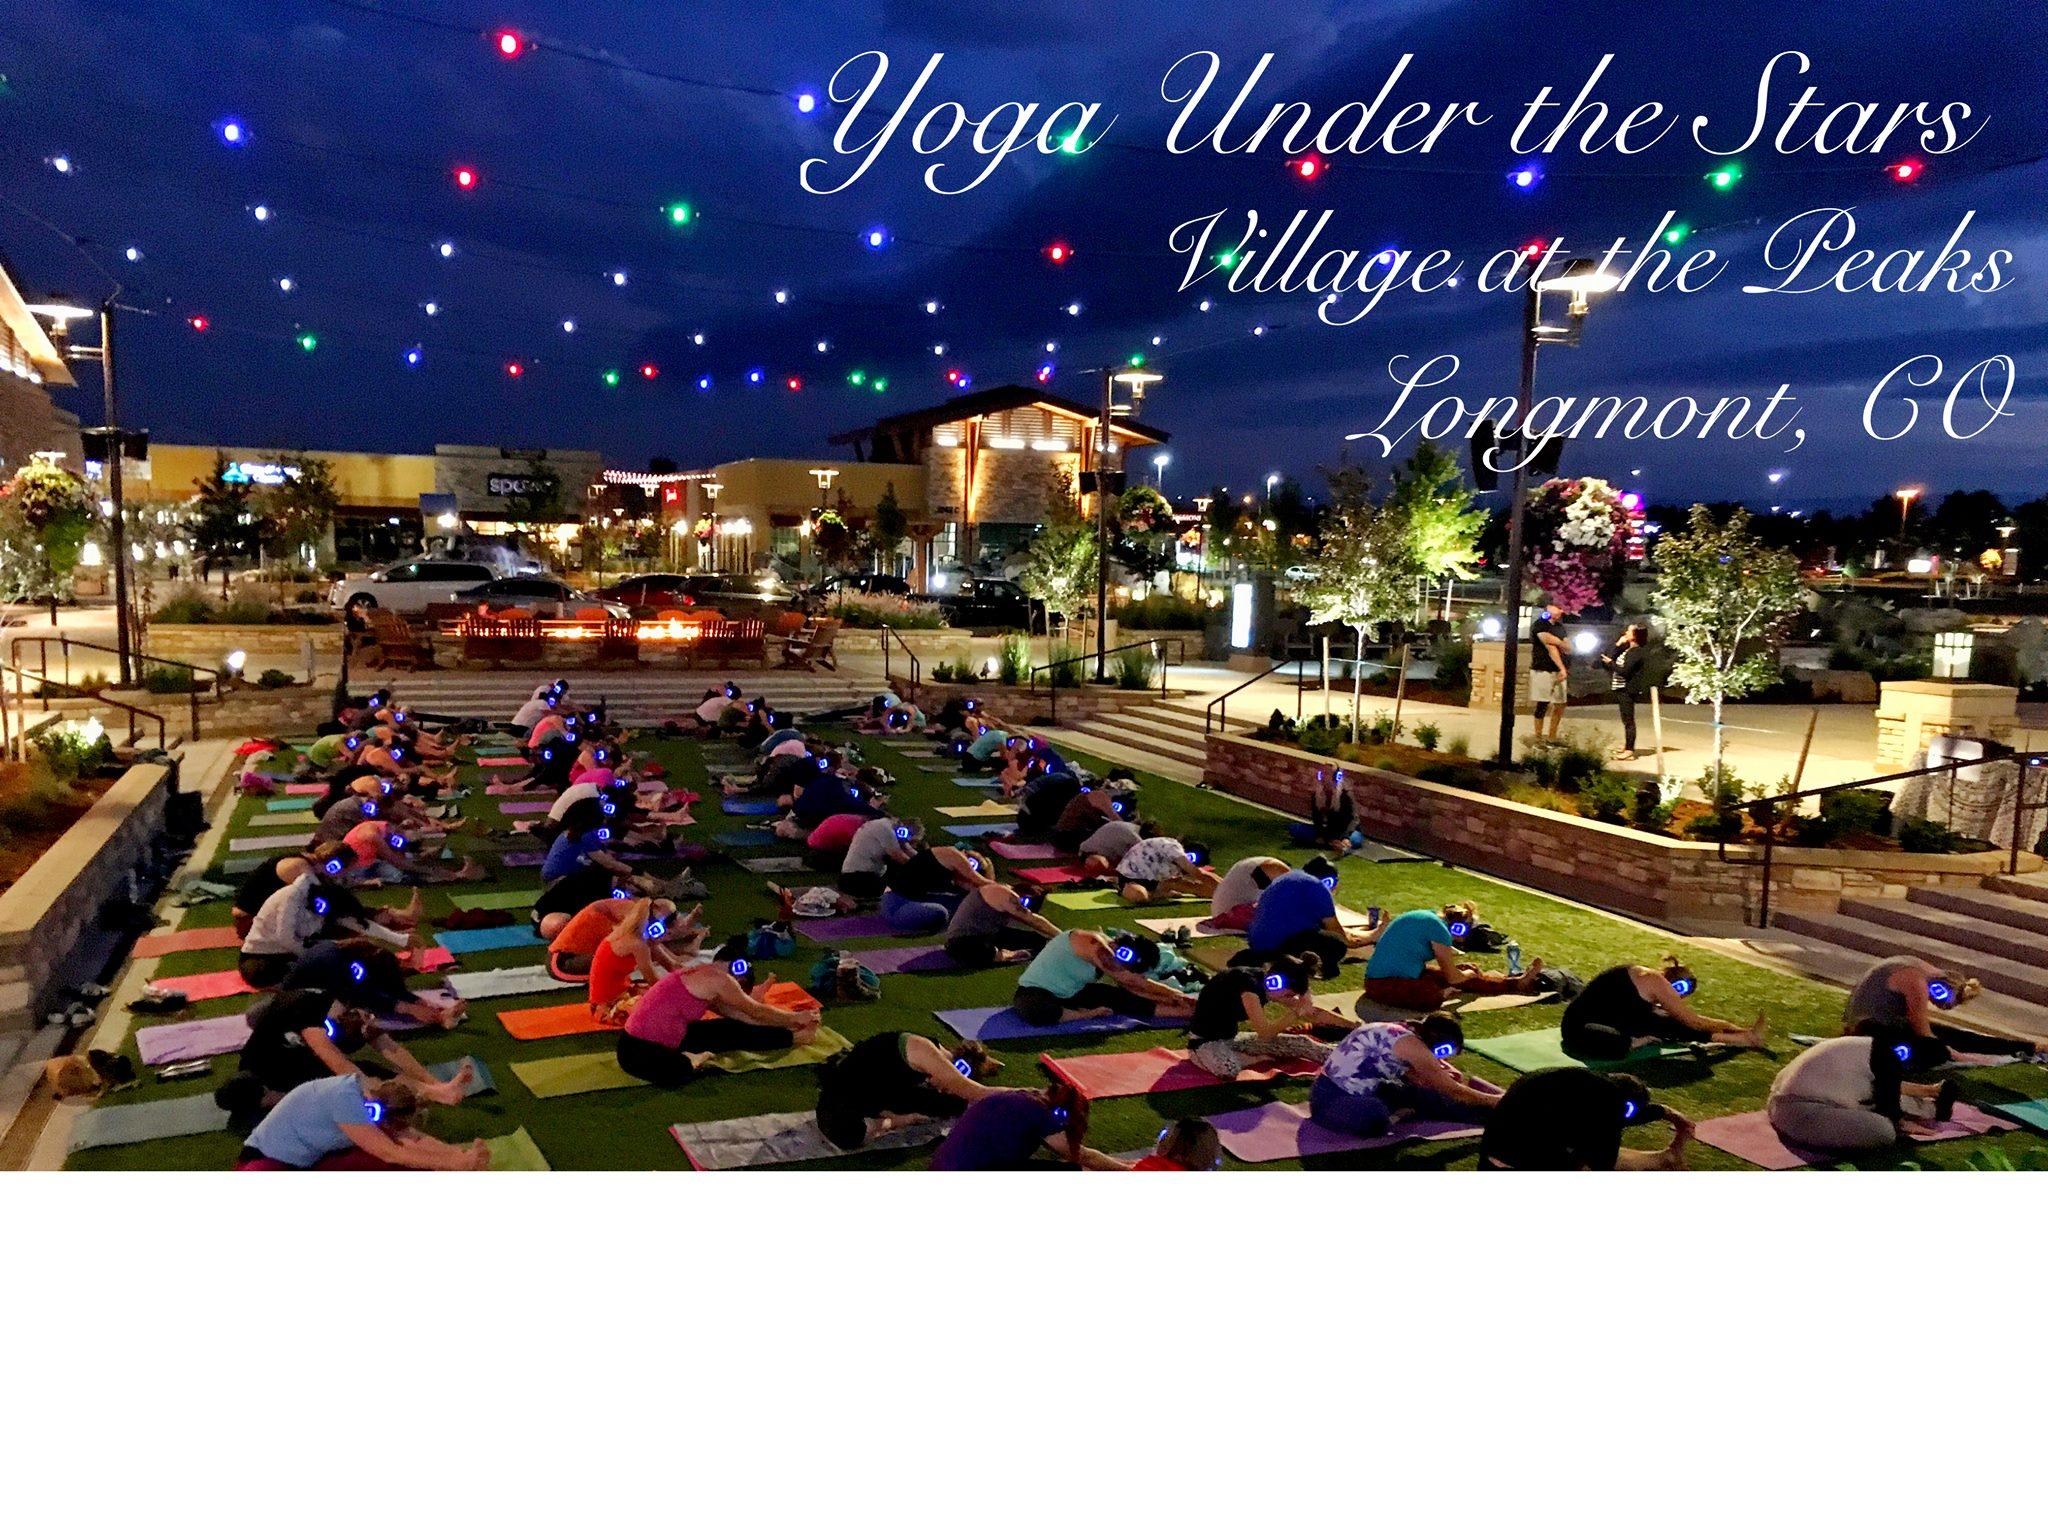 Yoga Under the Stars